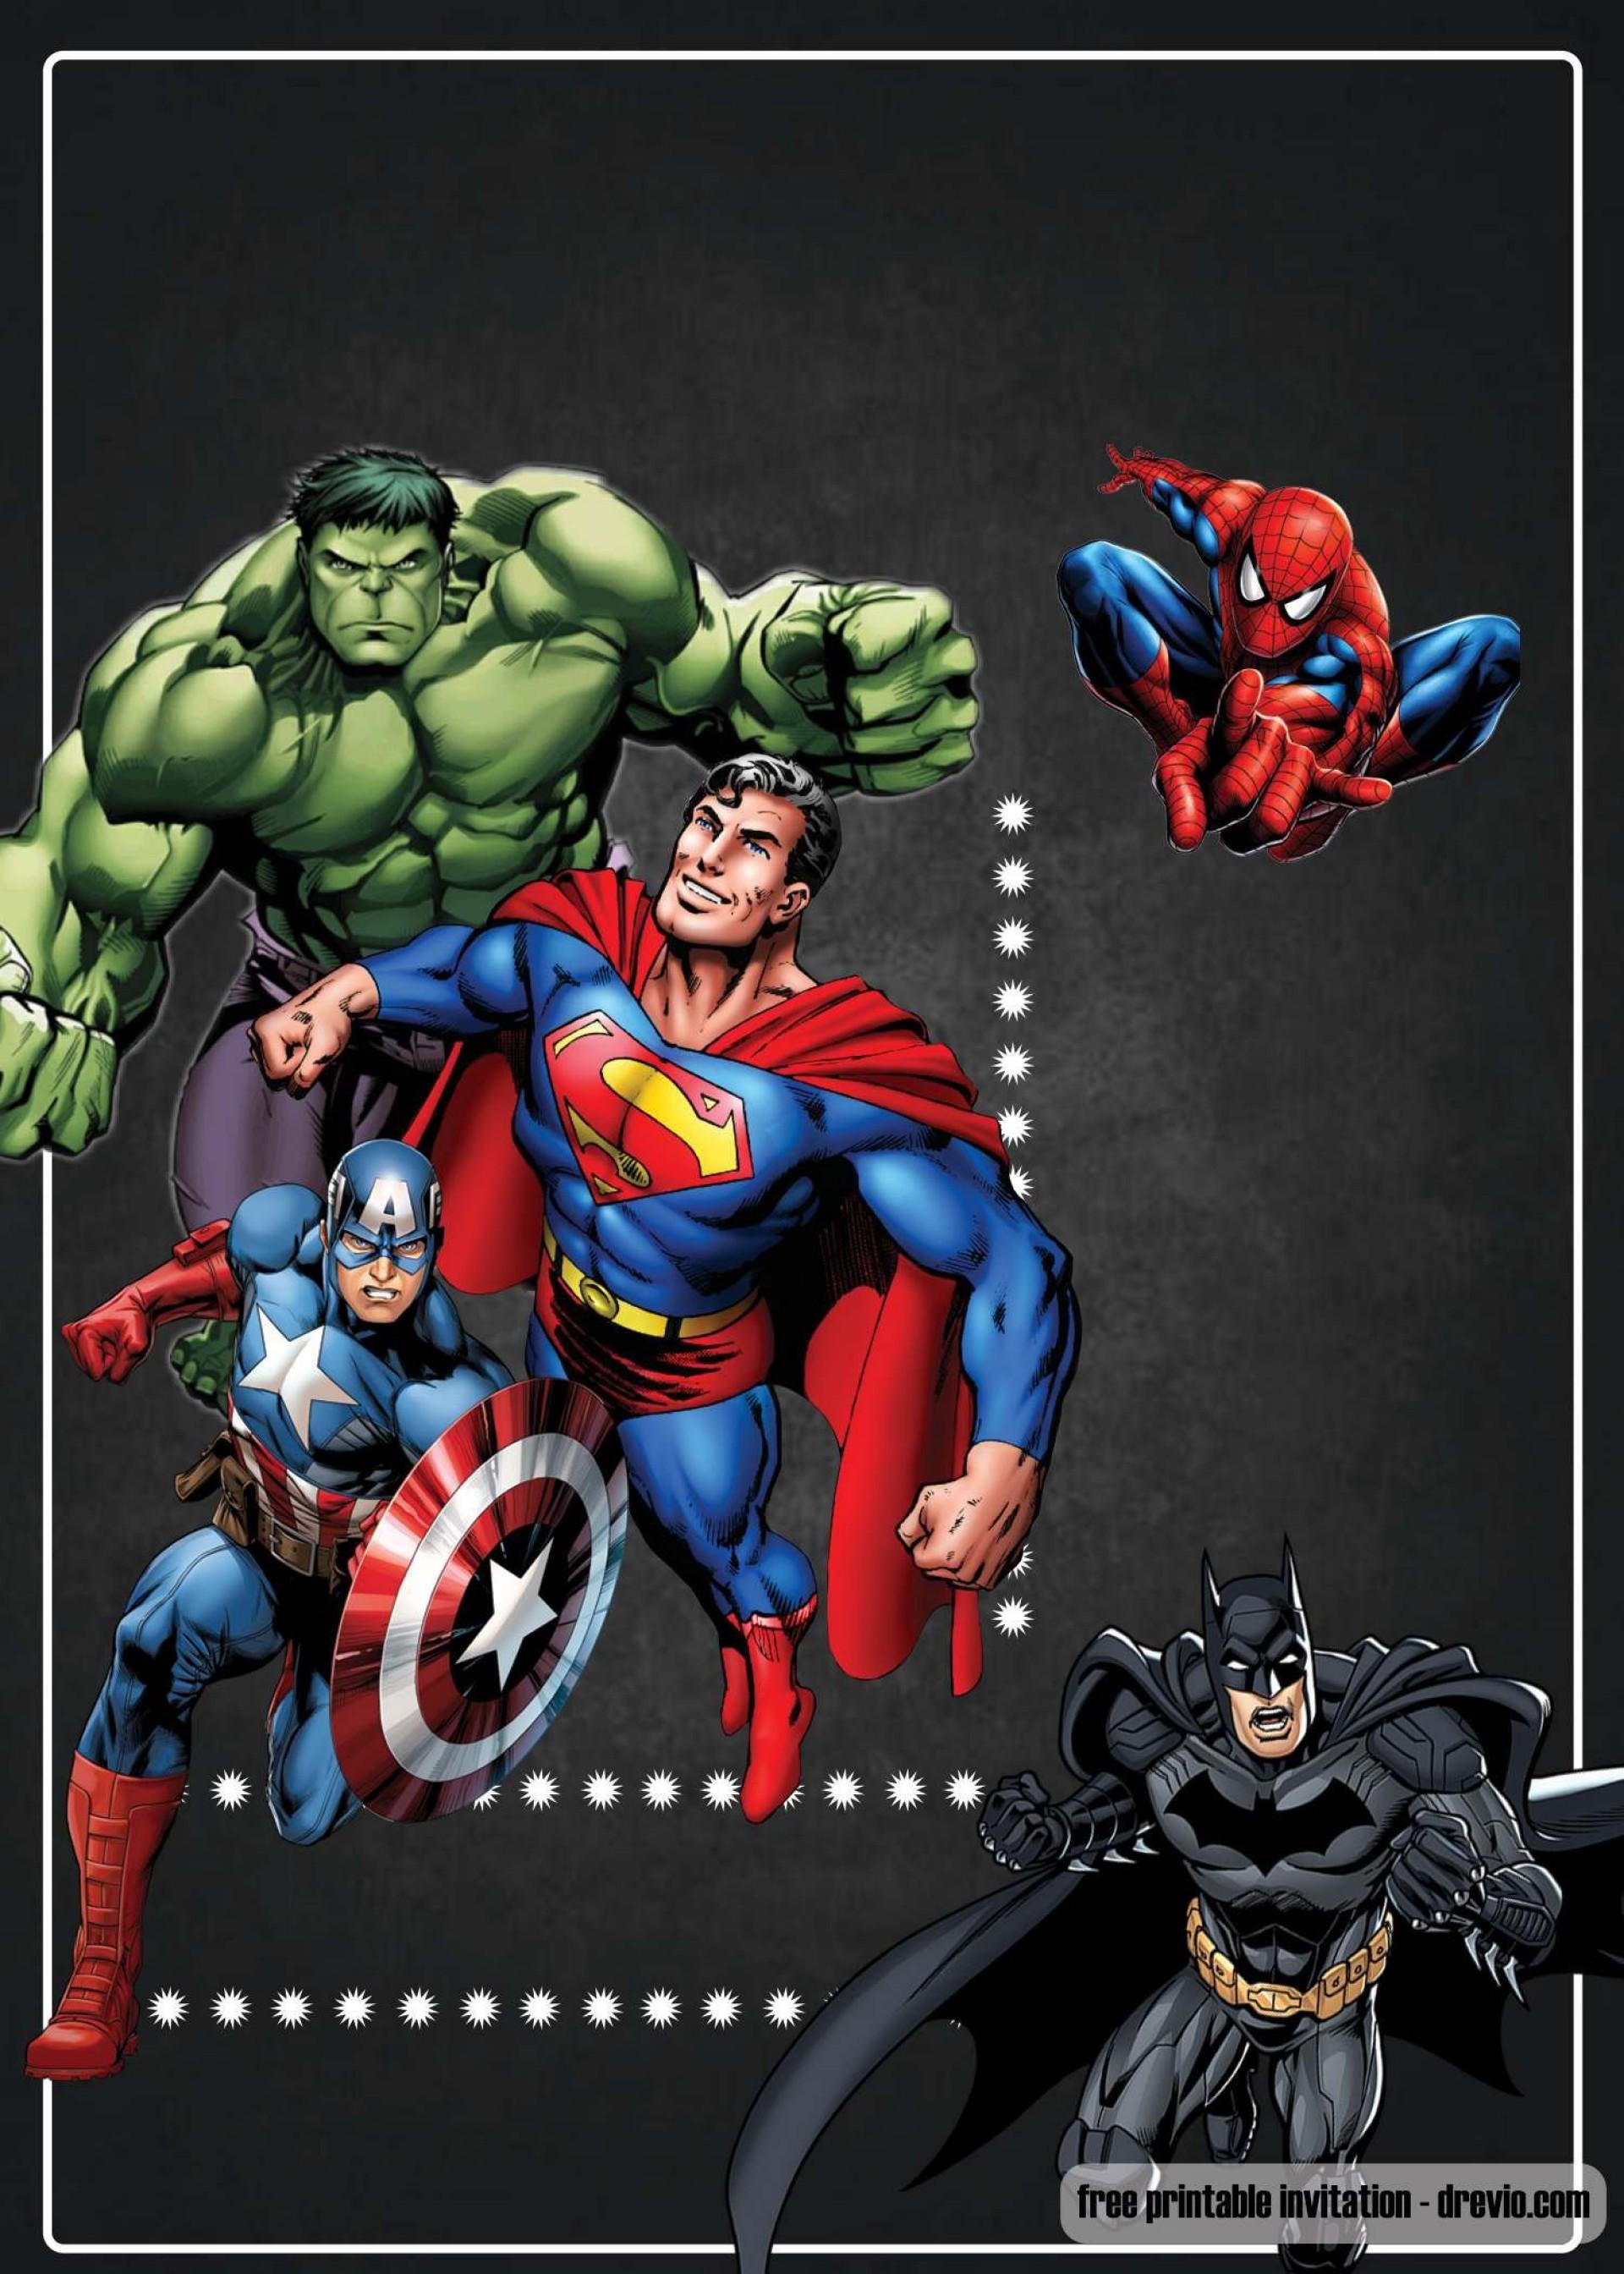 005 Unbelievable Superhero Birthday Party Invitation Template Free High Resolution  Invite1920